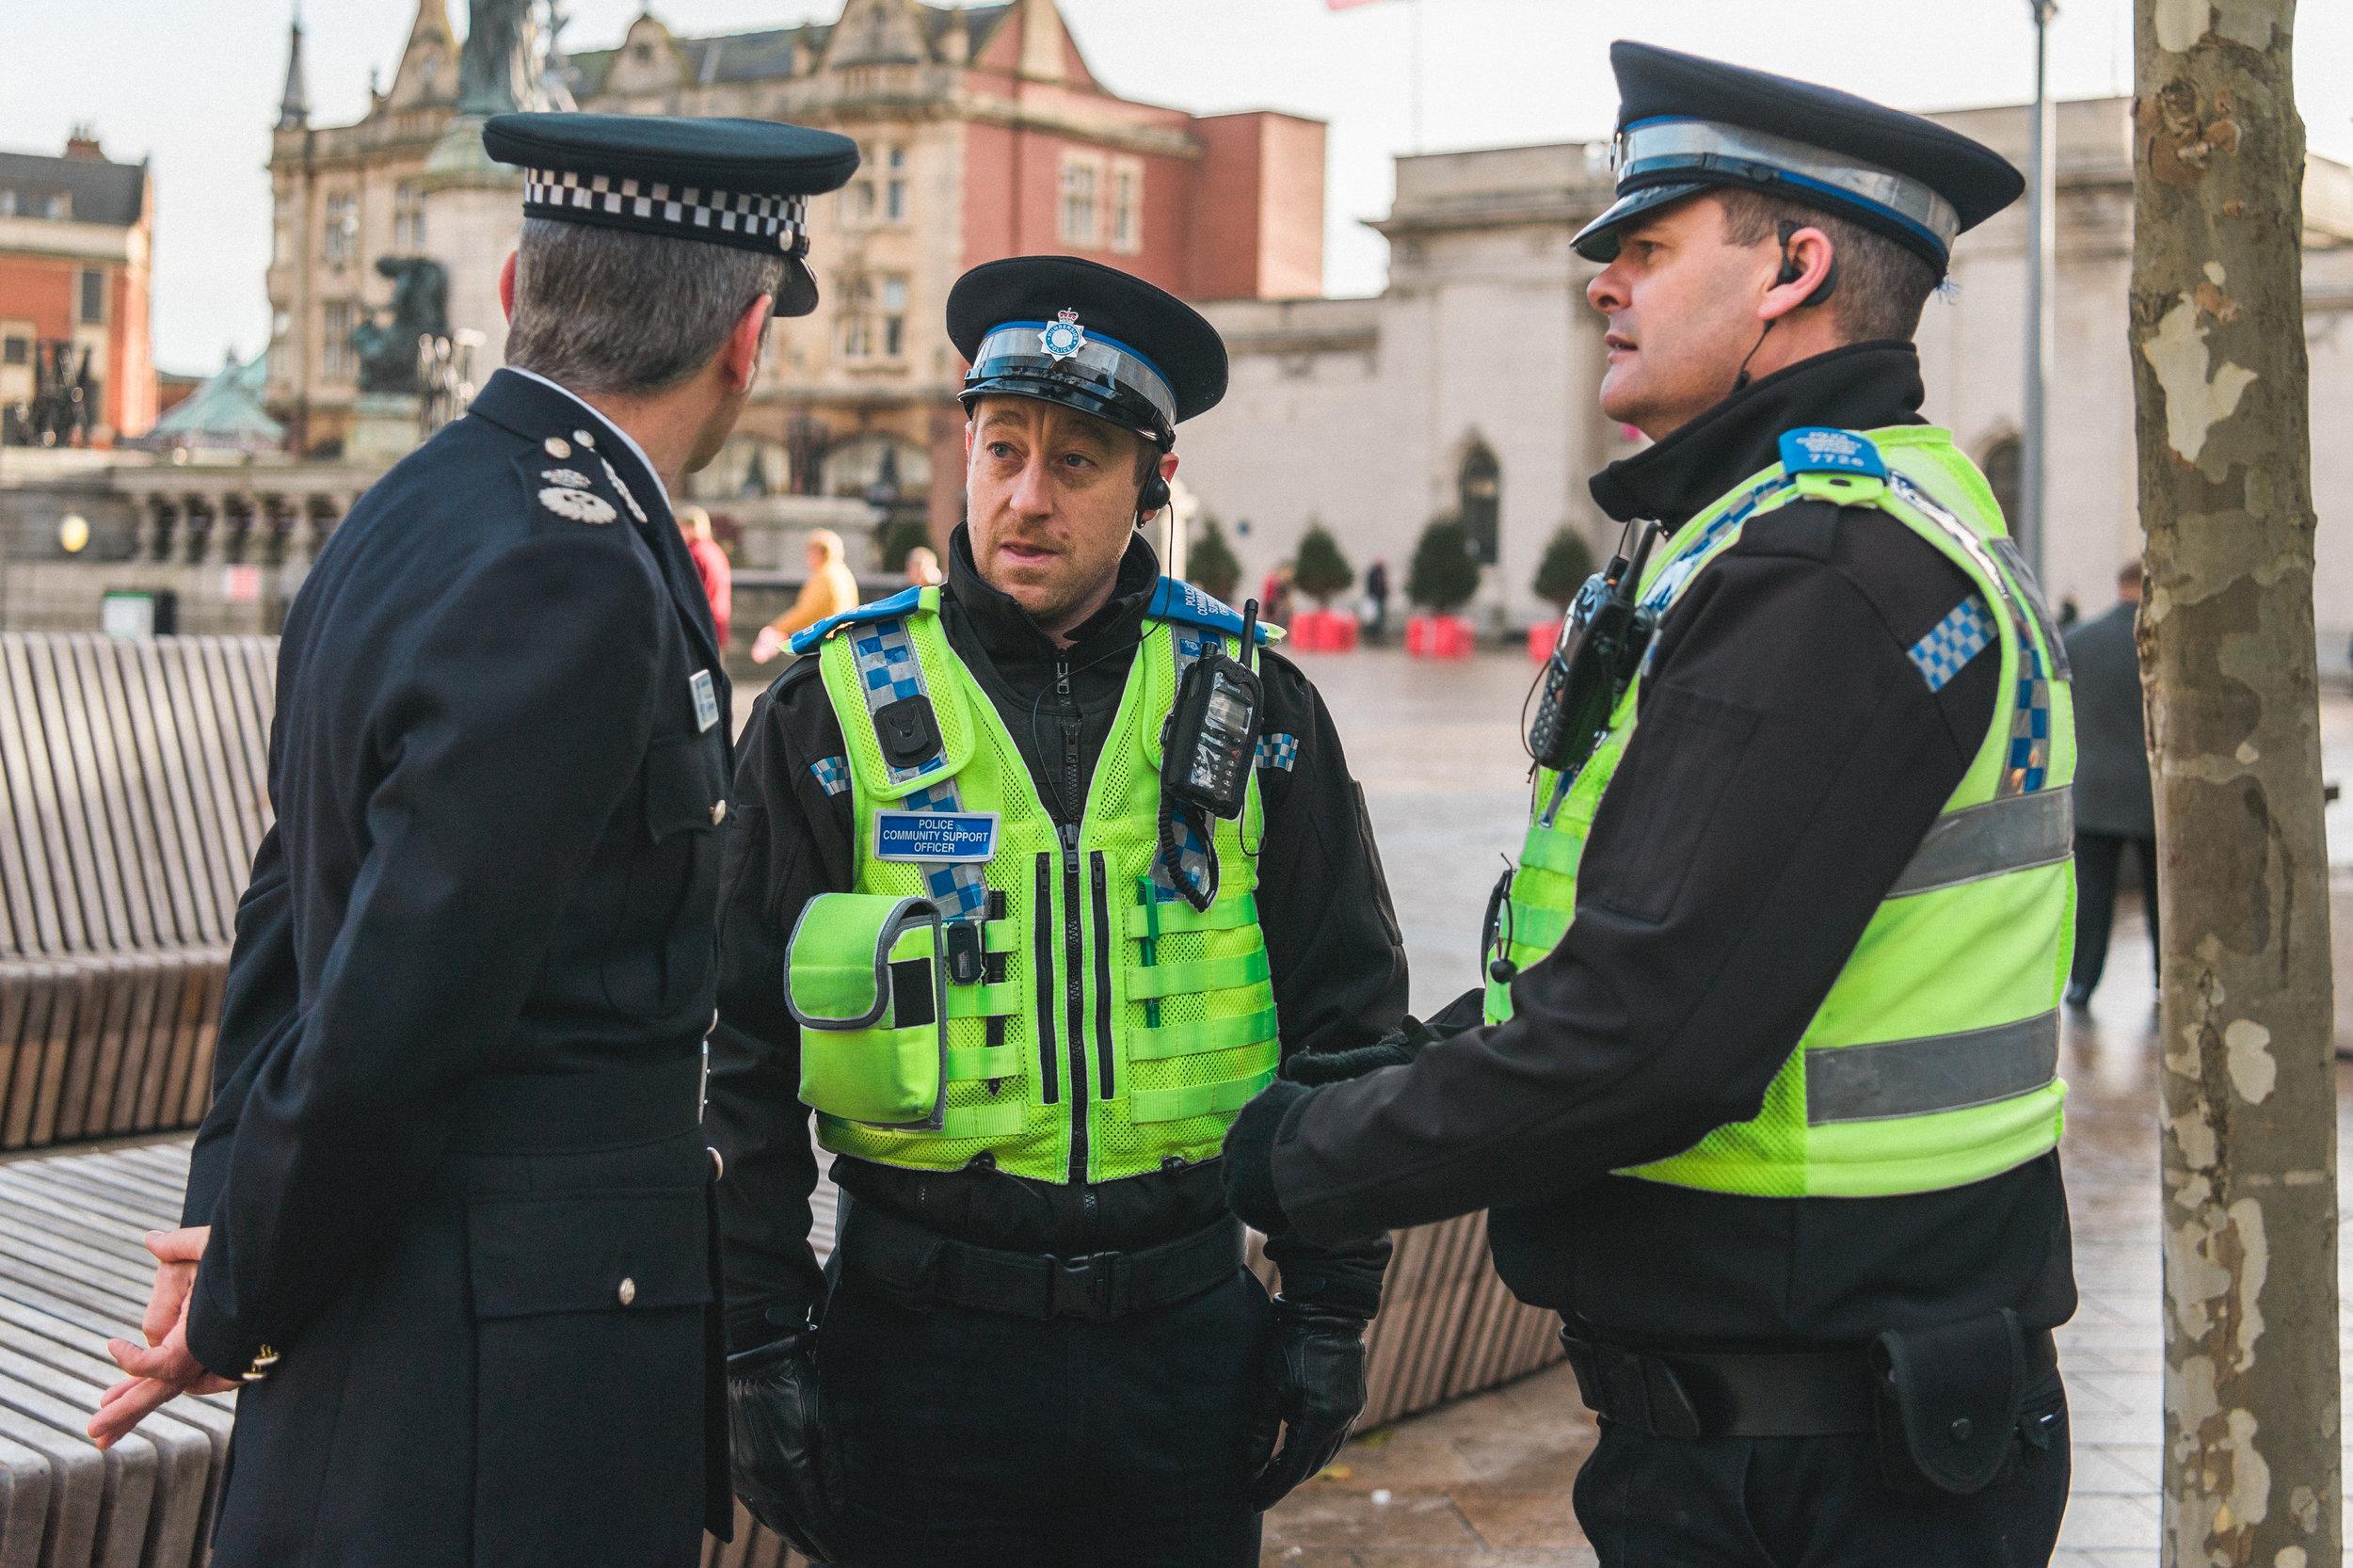 Police Images - www.patrickmateer.com LOW RES00048.jpg